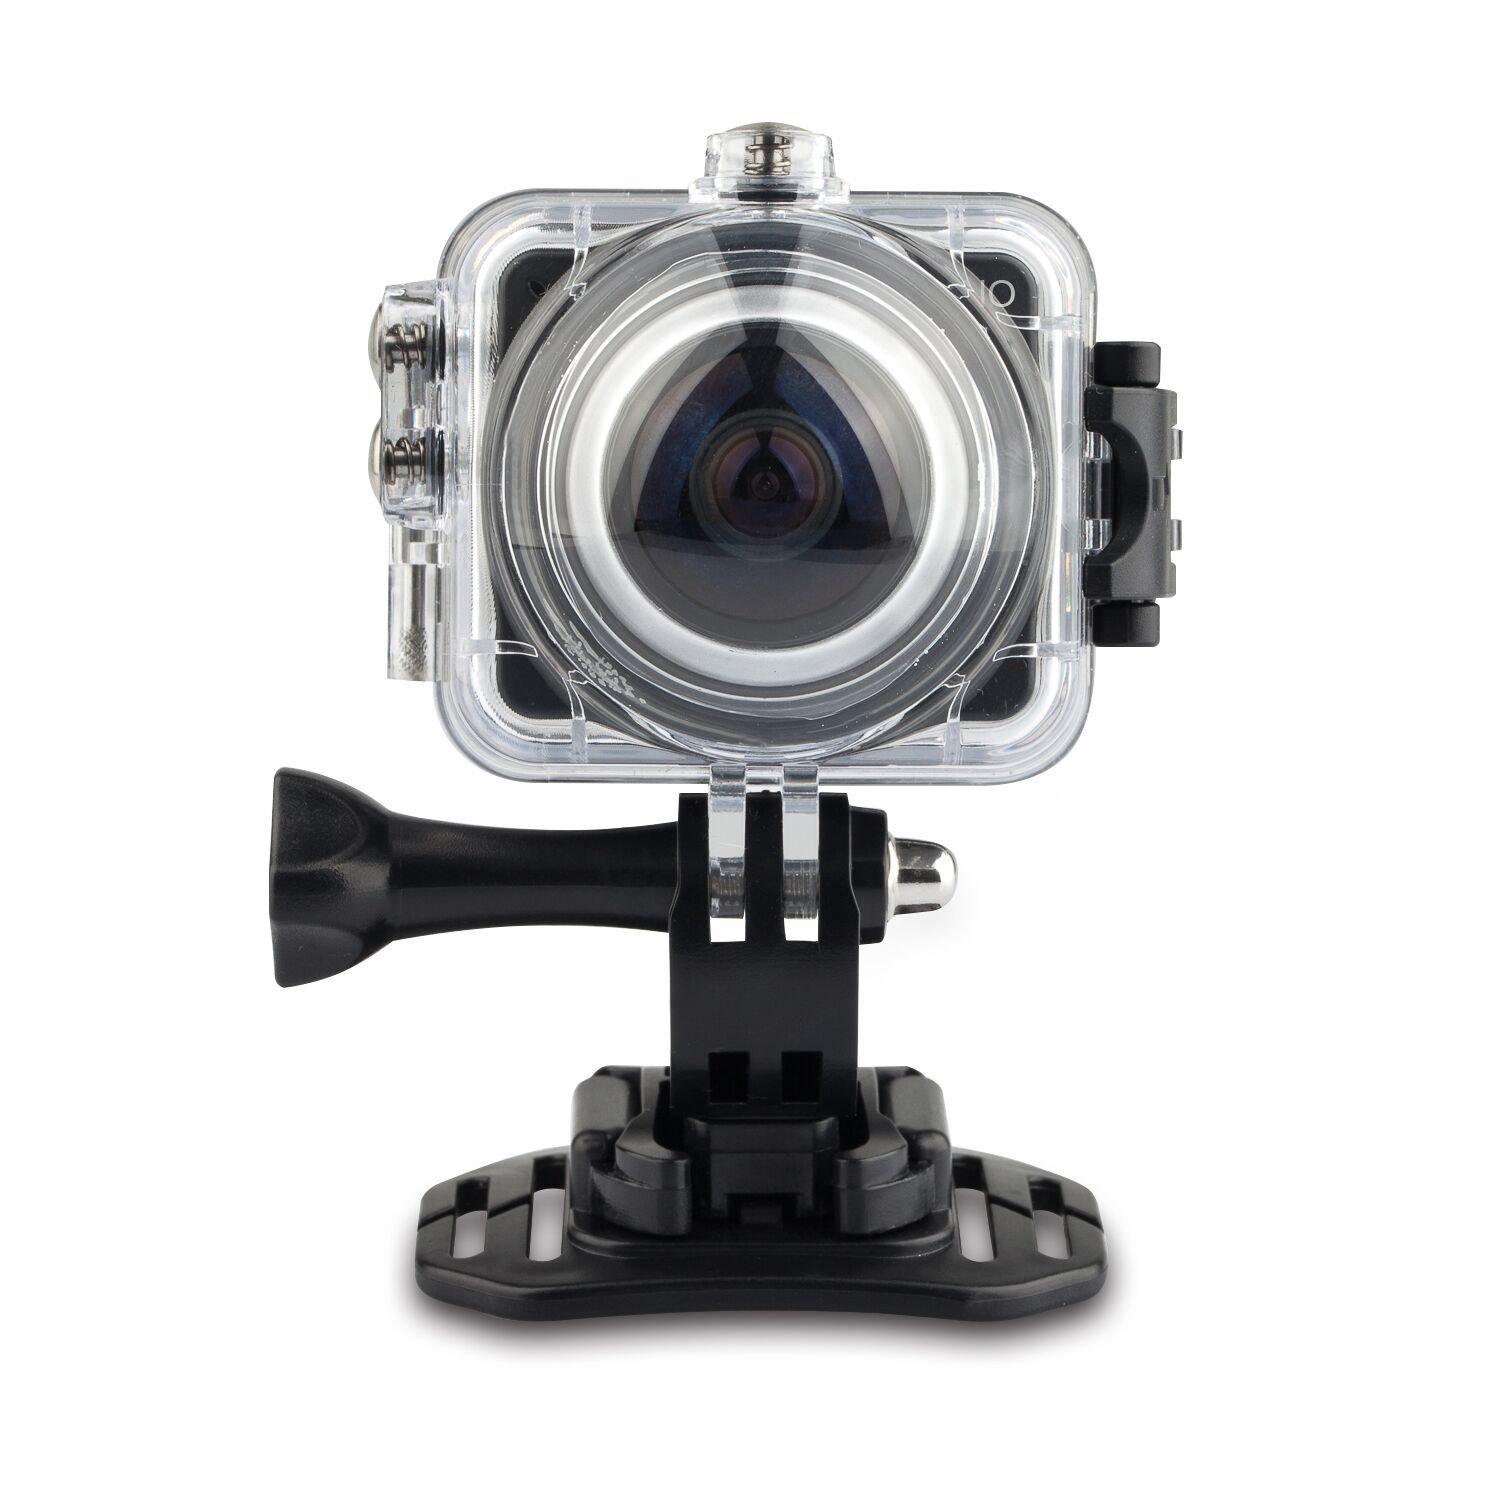 TechComm 360B VR 12 MP 360 Panoramic Action WiFi Camera CMOS Sensor